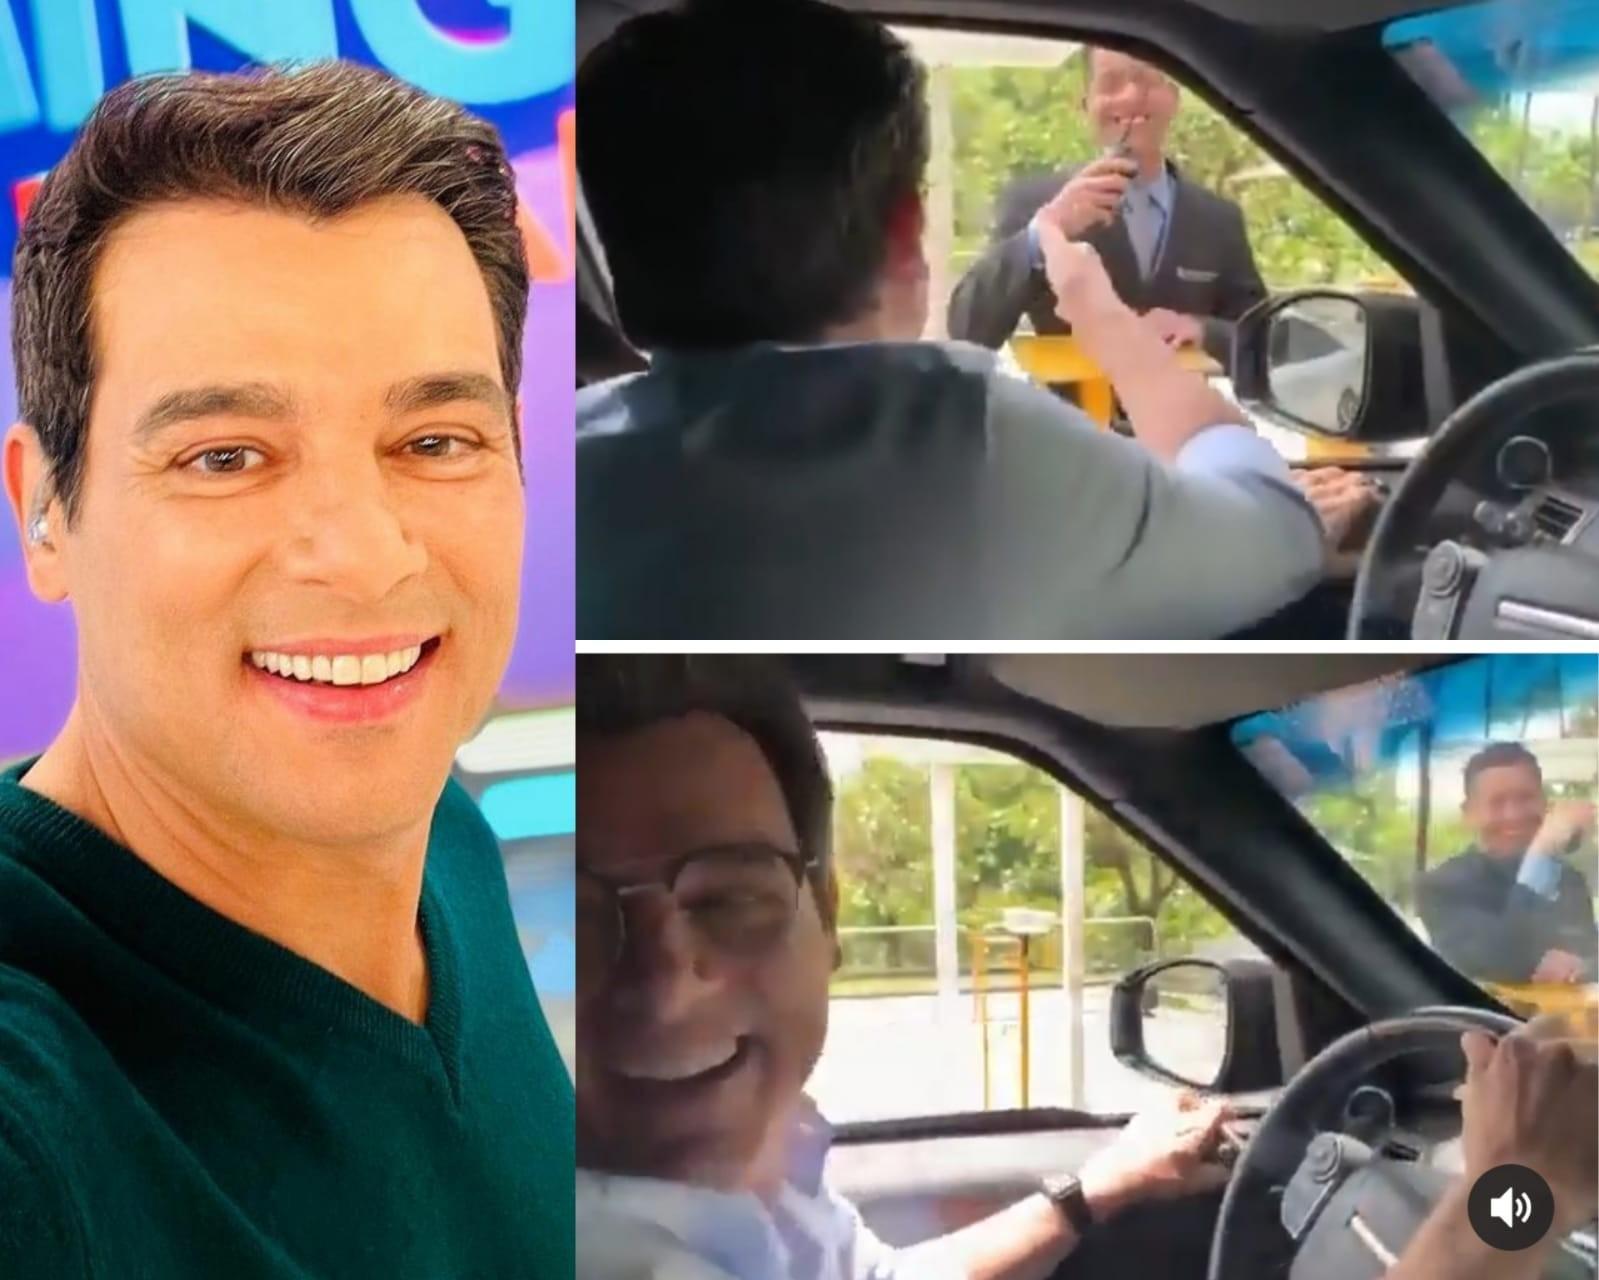 Celso Portiolli trola segurança da Globo